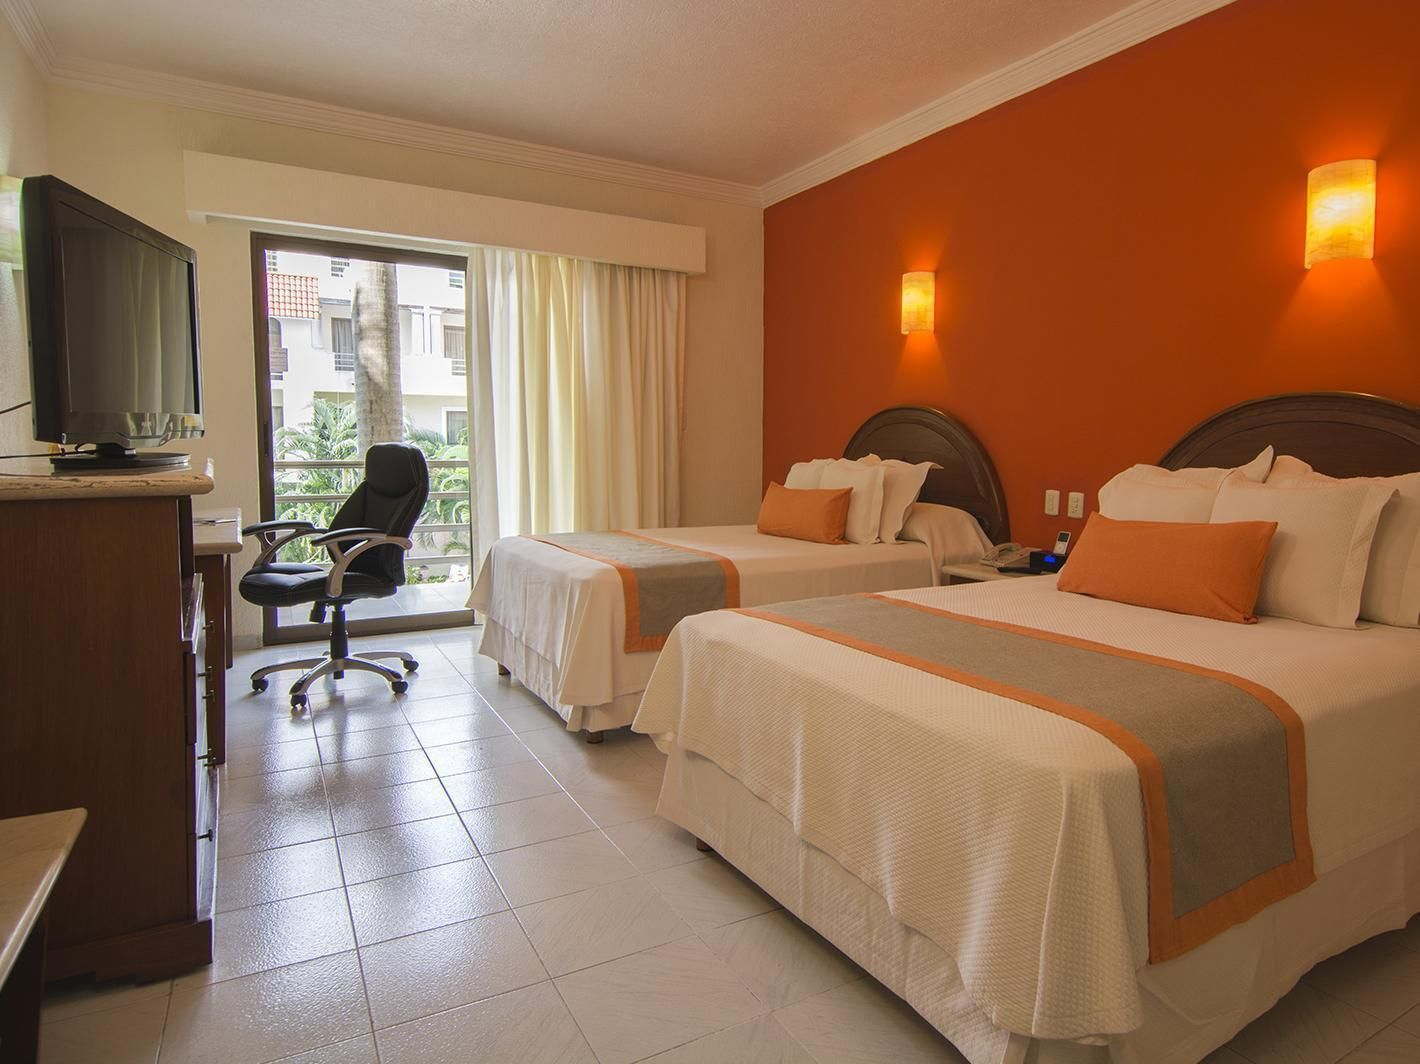 Adhara Hacienda Cancun Hotel Adhara Hacienda Cancun Hotel Cancun Mexico North America